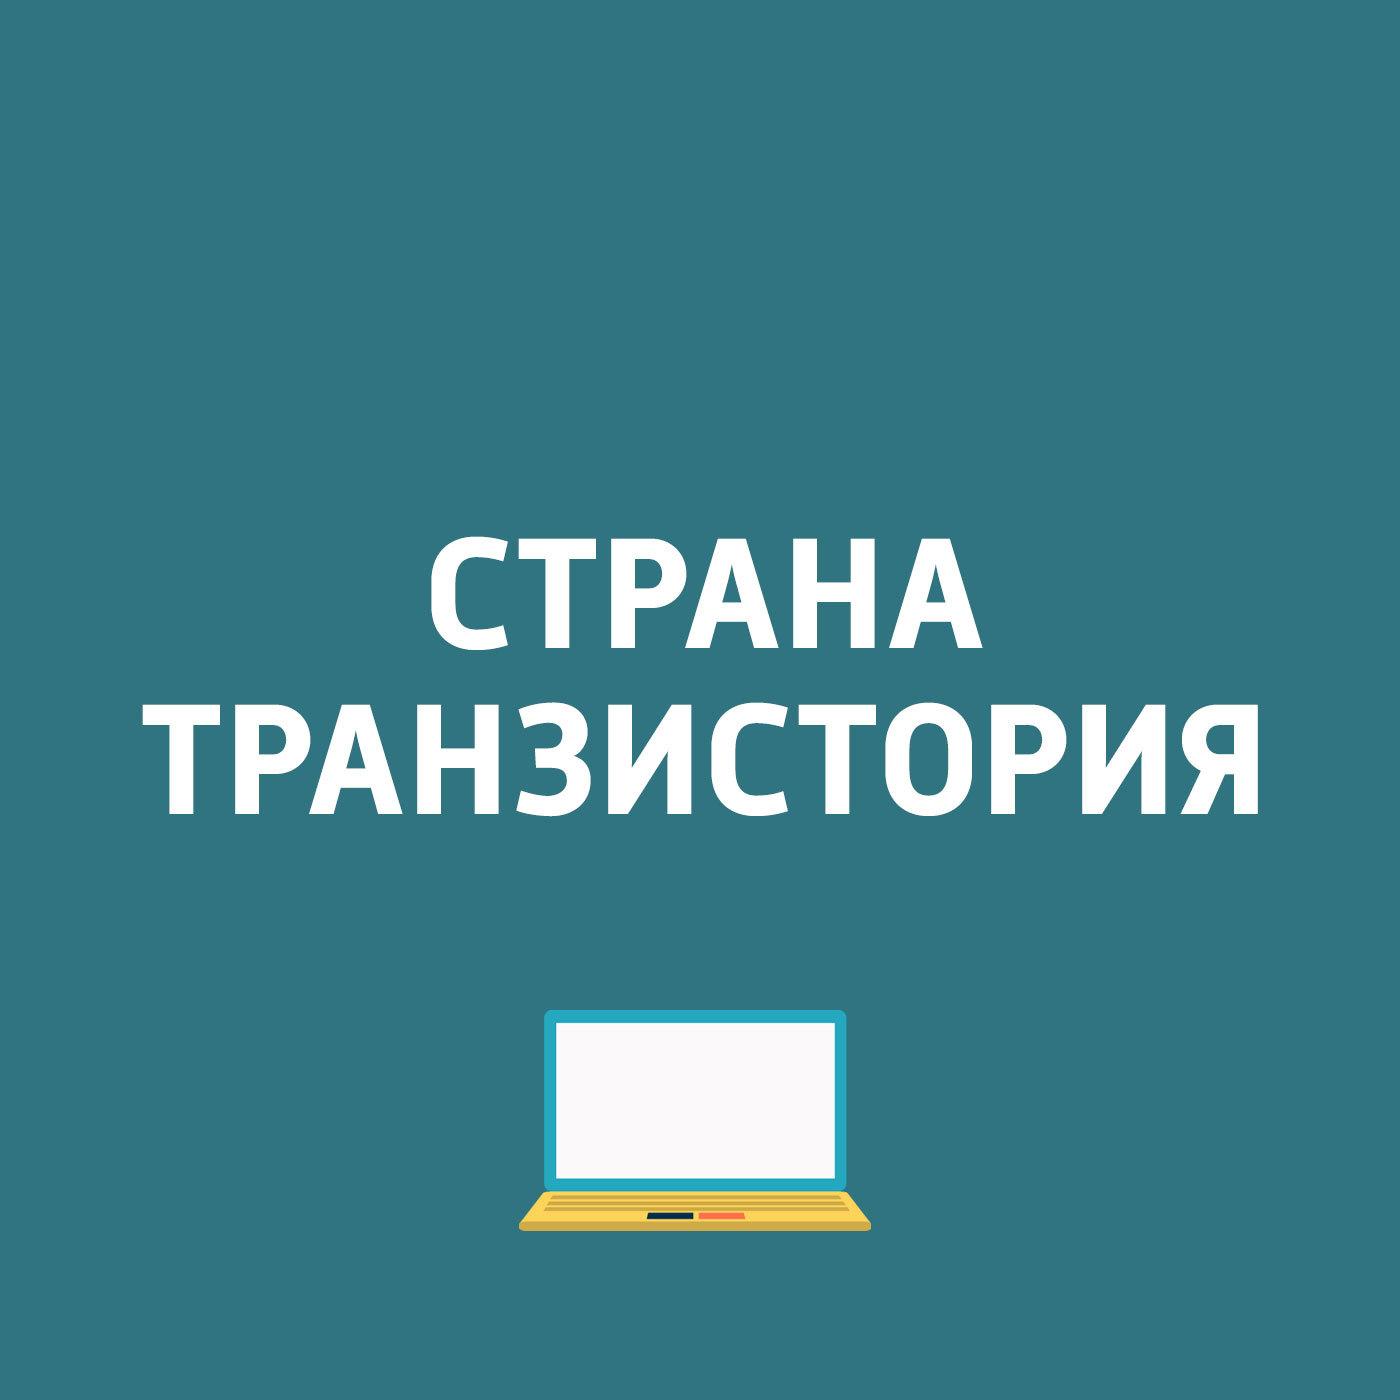 Картаев Павел Киберспорт в России приравняли к футболу... картаев павел сырники